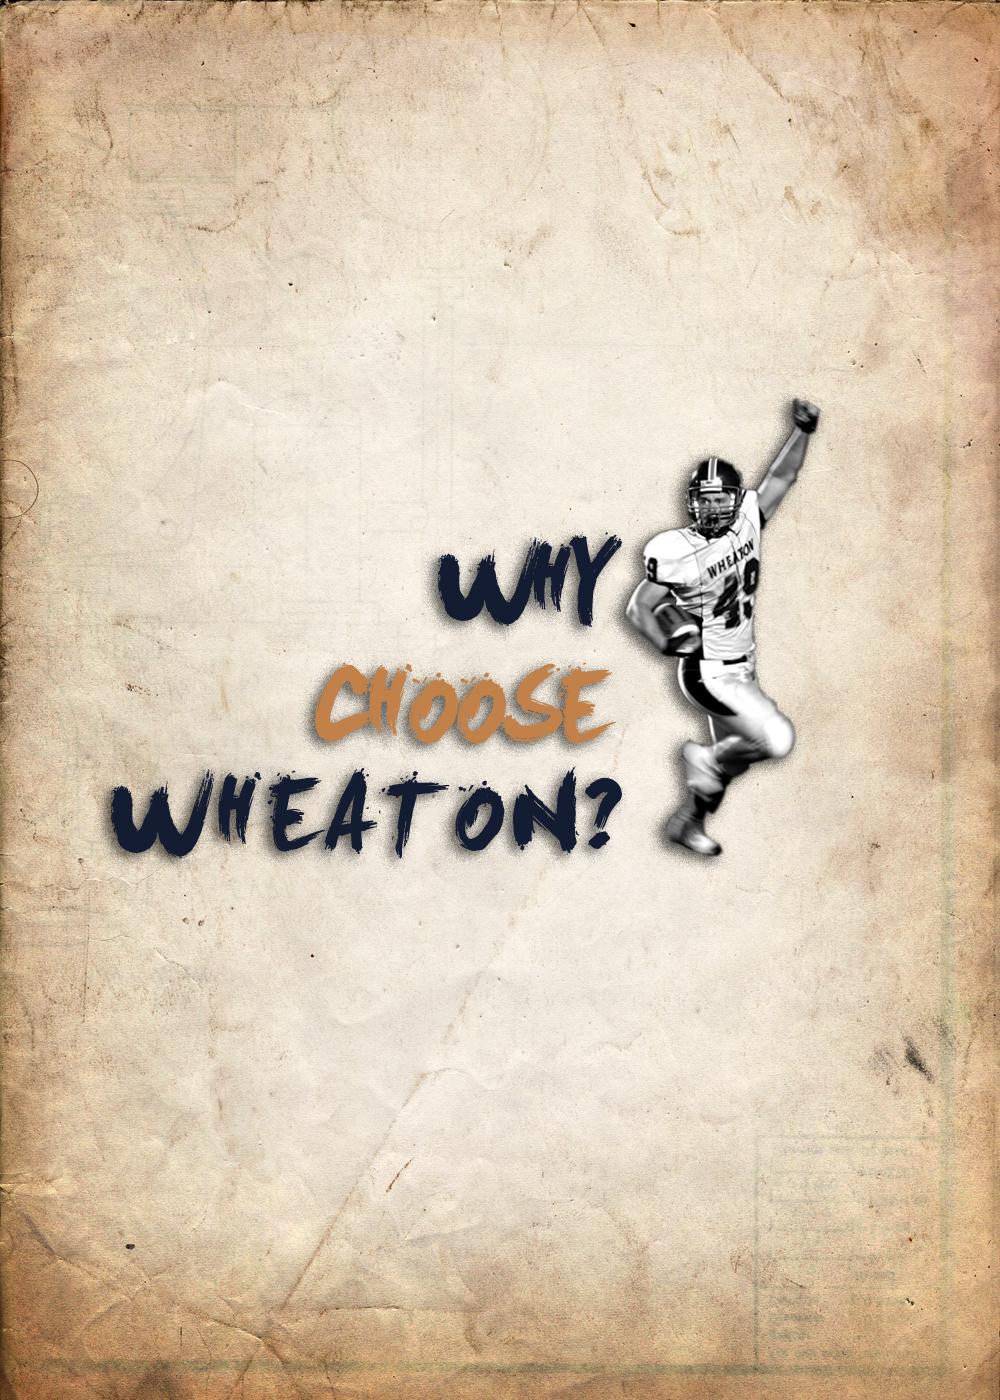 wheatondvdcoverfront.jpg